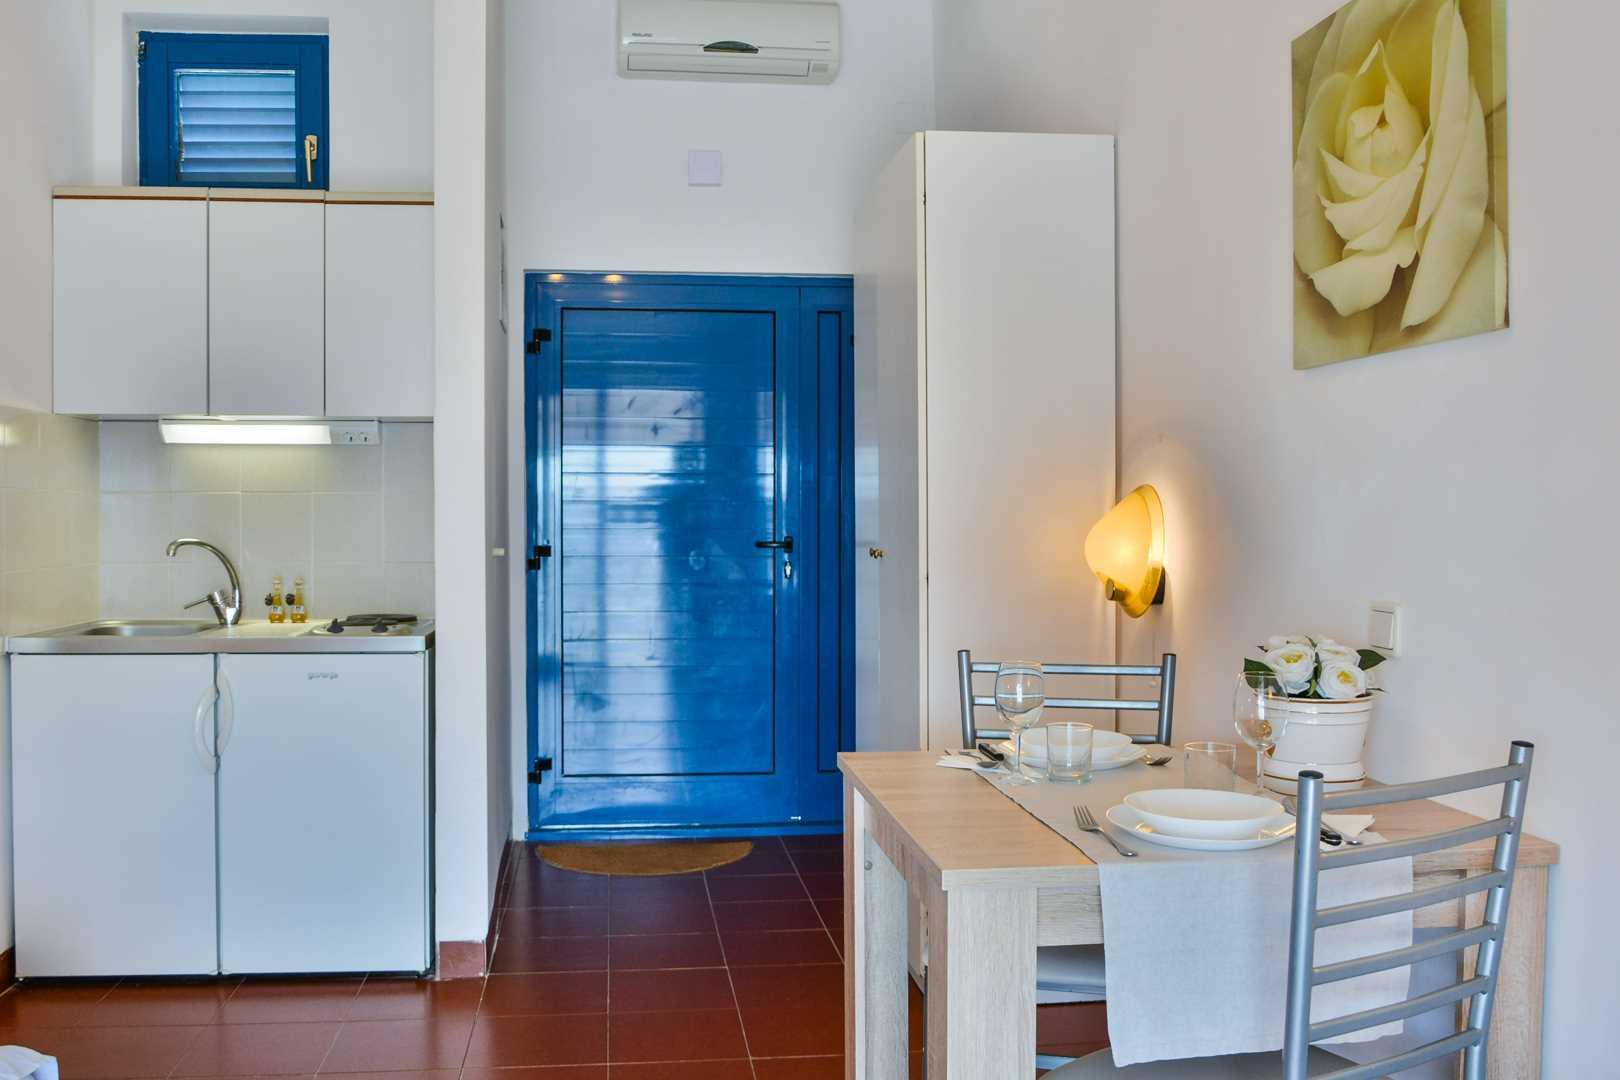 Studio Miki - Apartment 4 50056, Donja Klada, , Région de Kvarner